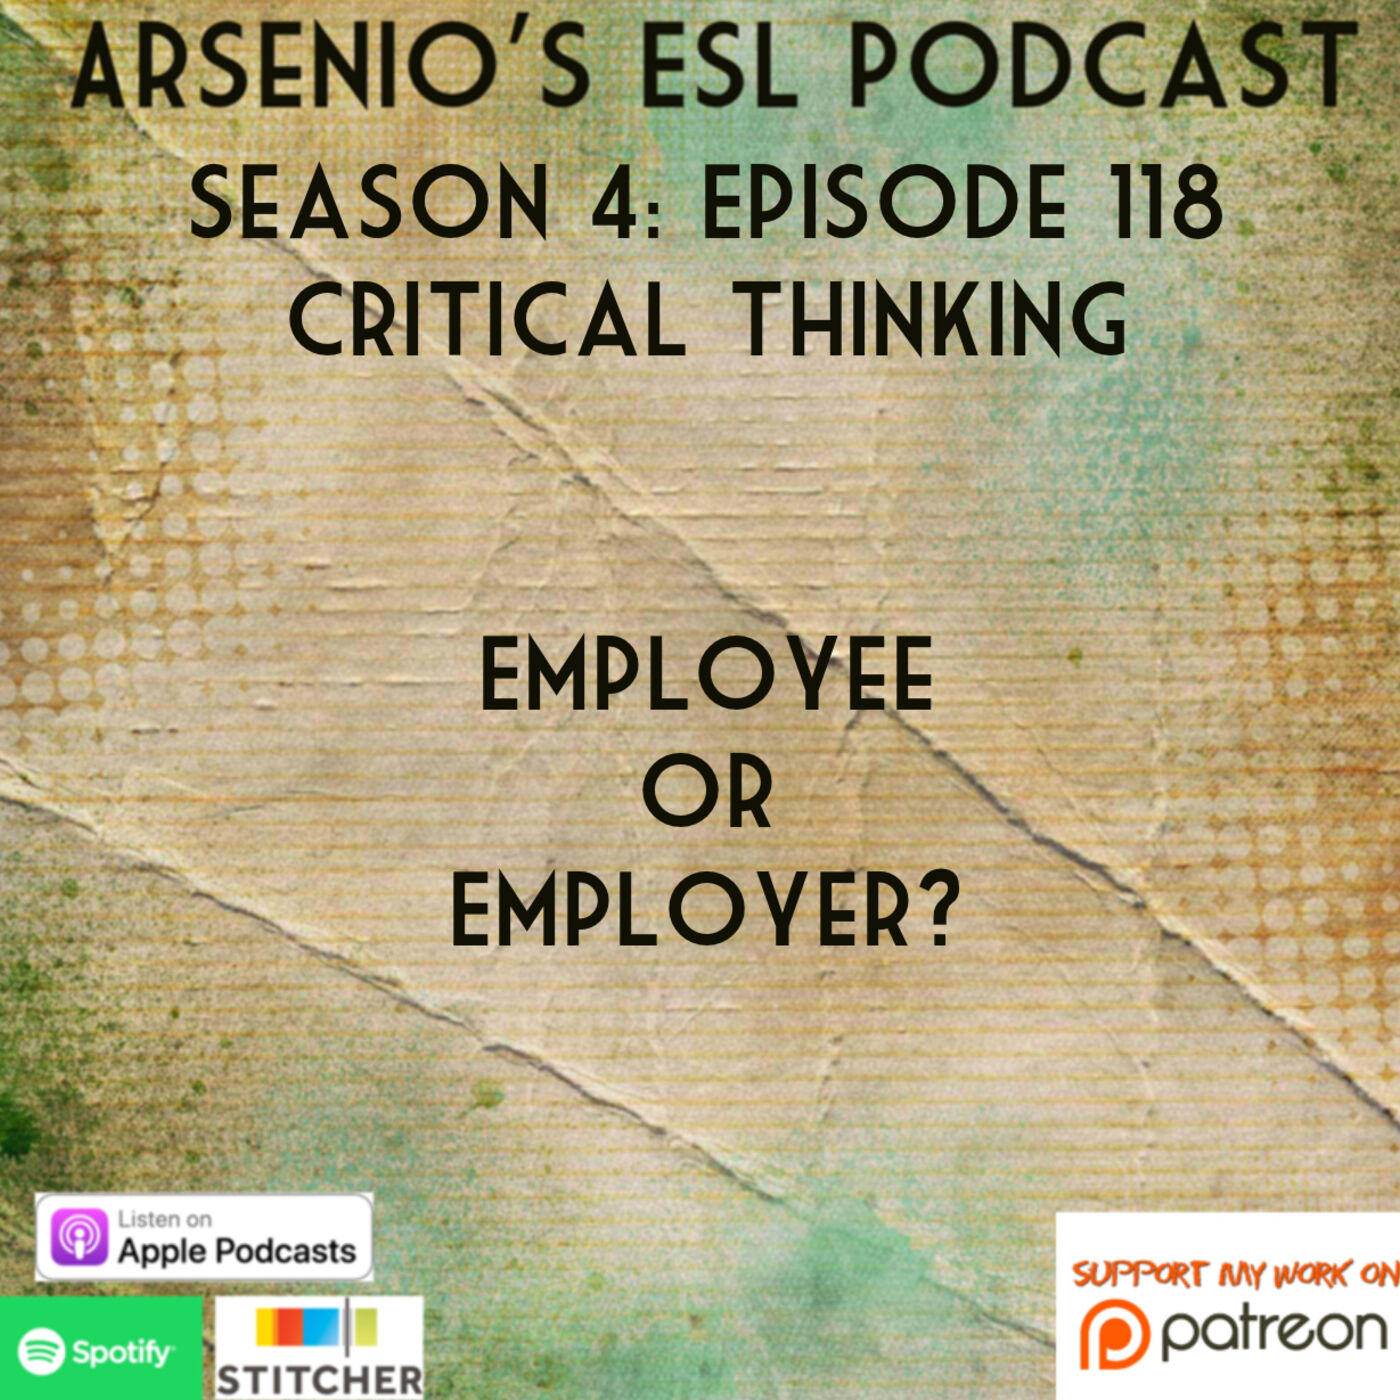 Arsenio's ESL Podcast: Season 4 - Episode 118 - Critical Thinking - Employee vs. Employer